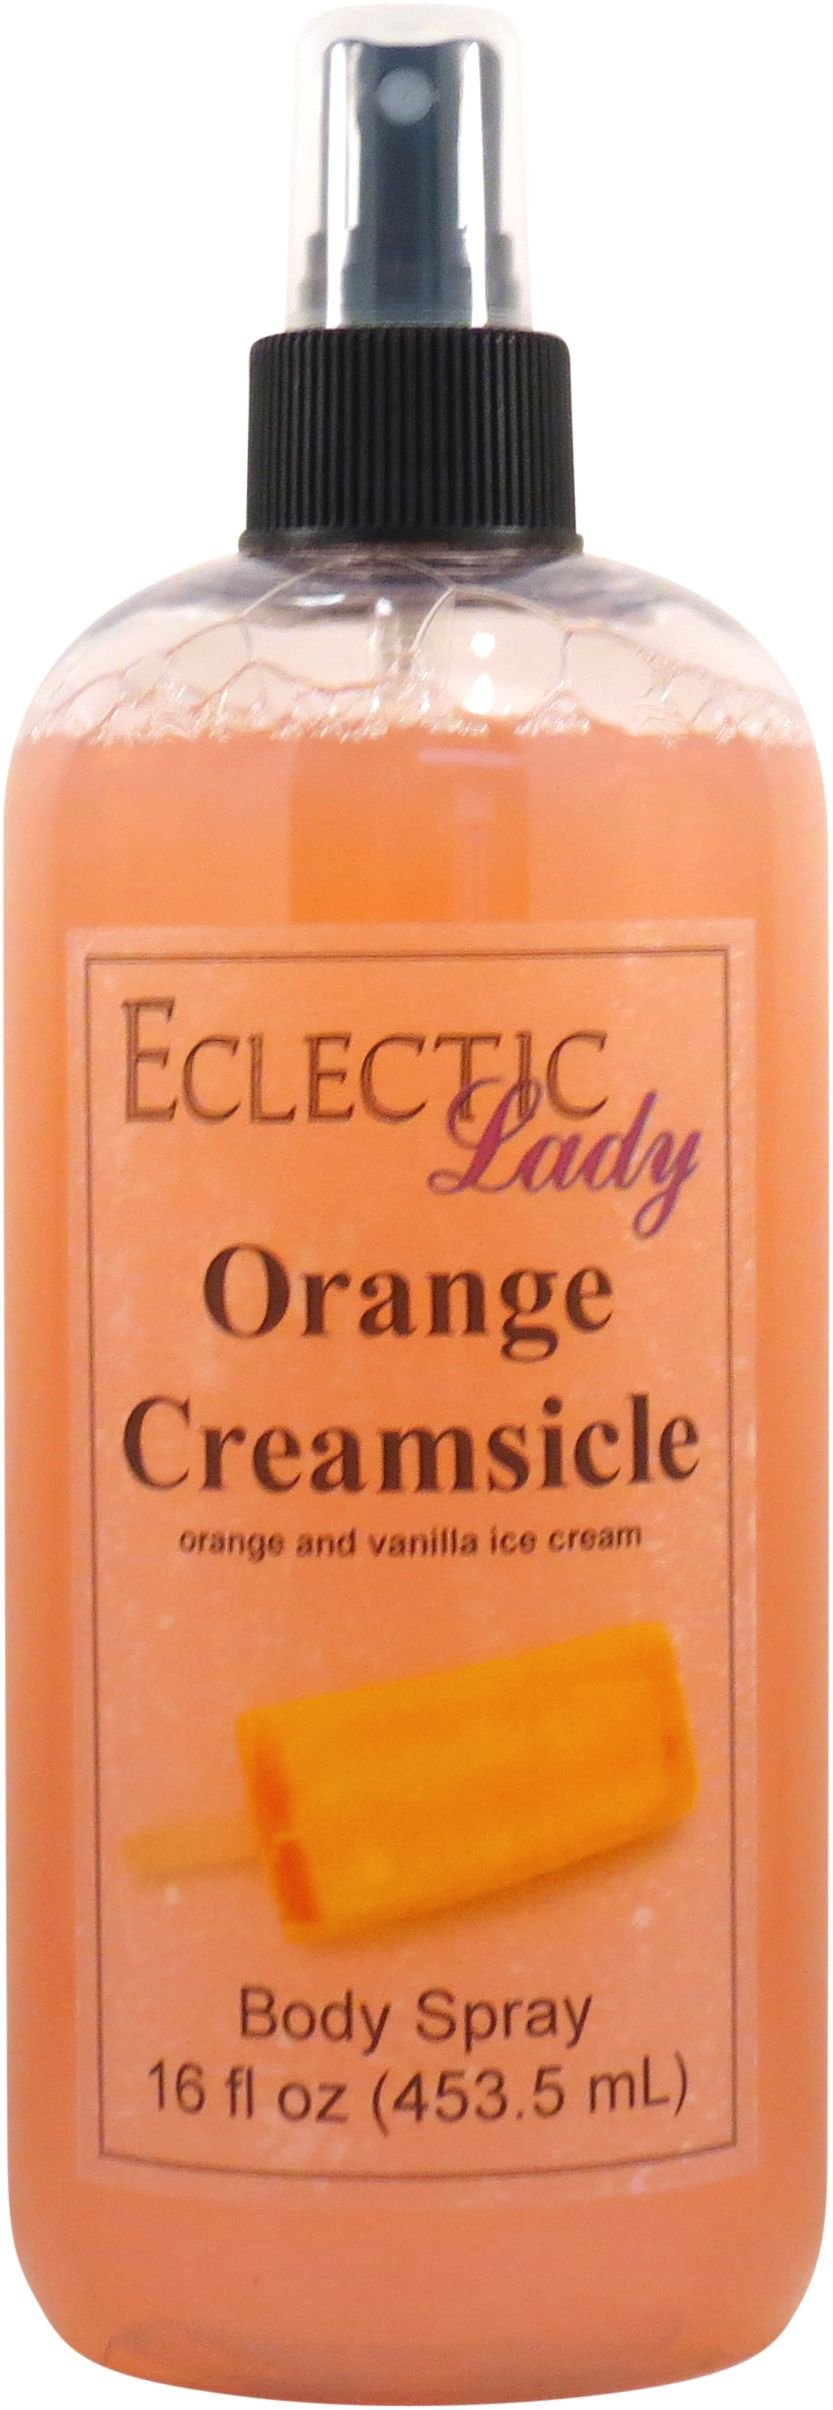 Orange Creamsicle Body Spray, 16 ounces